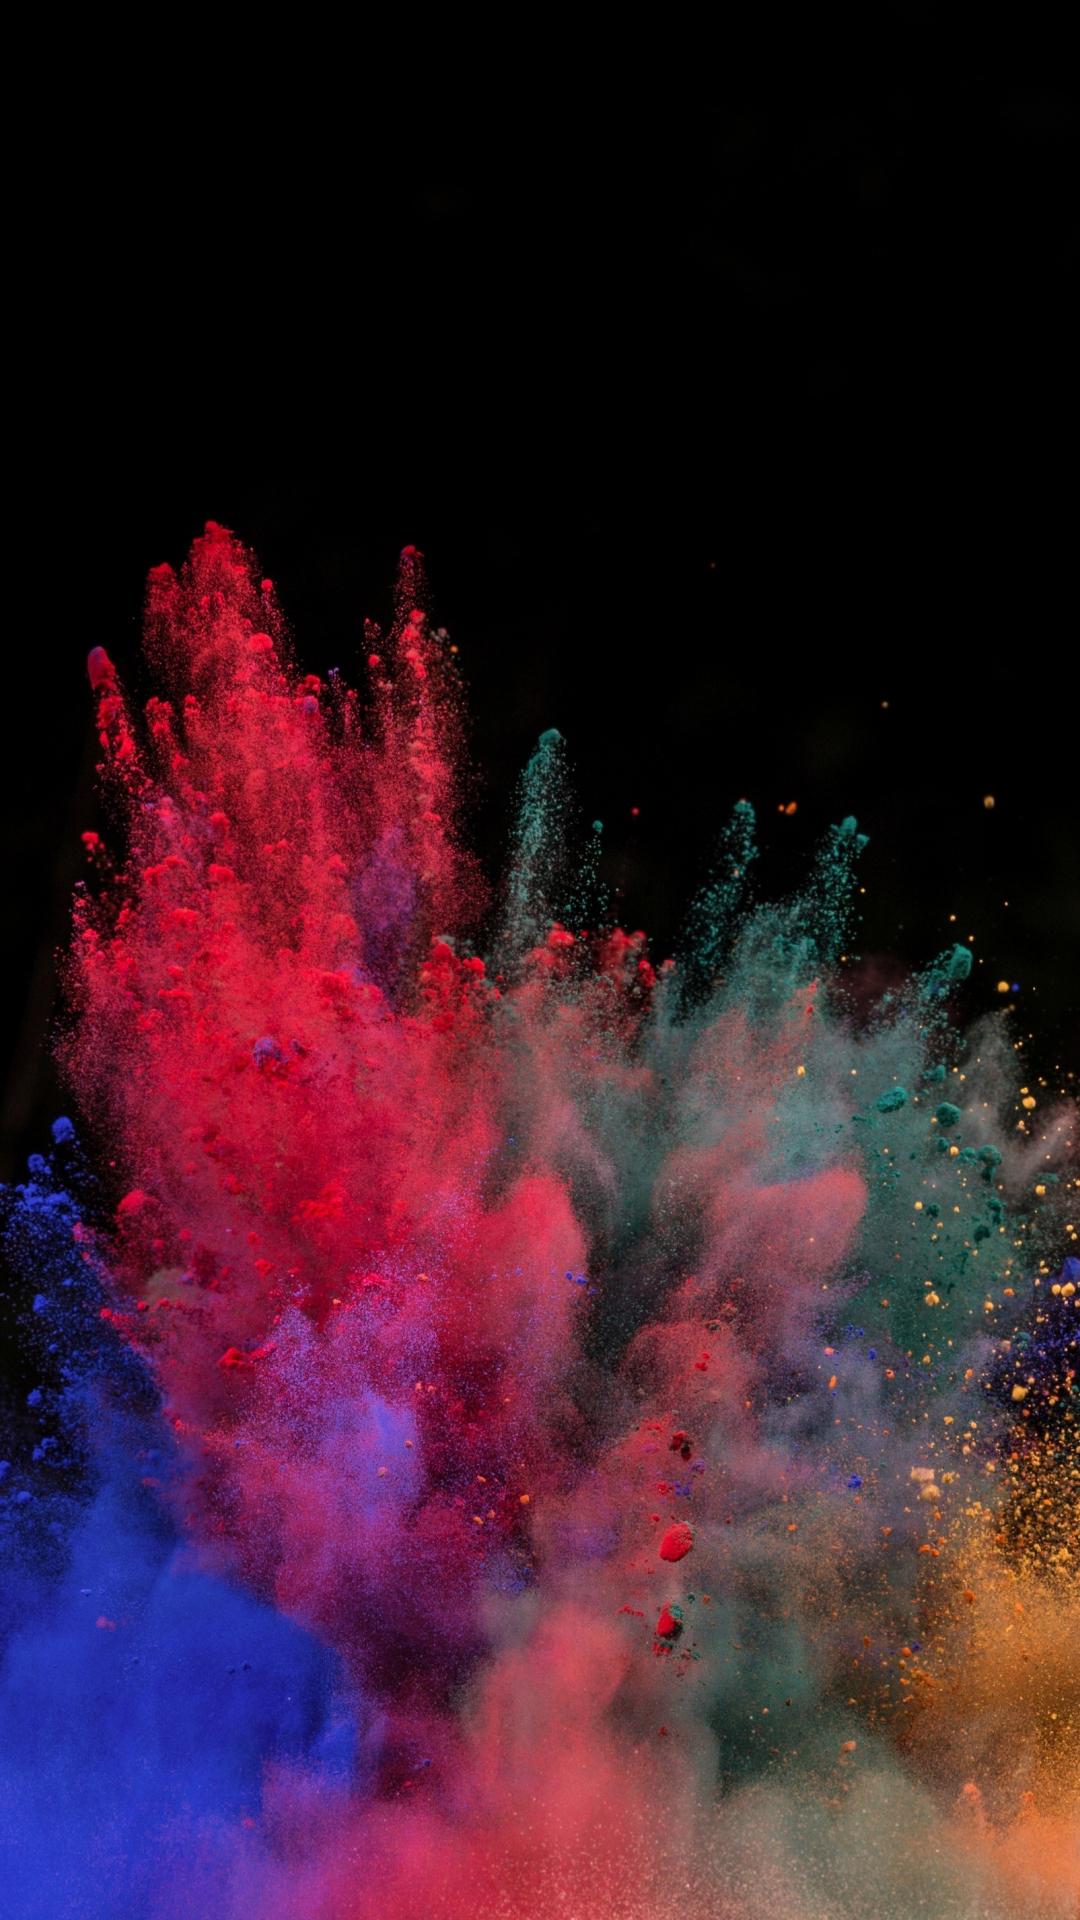 Download 1080x1920 Wallpaper Color Explosion Powders